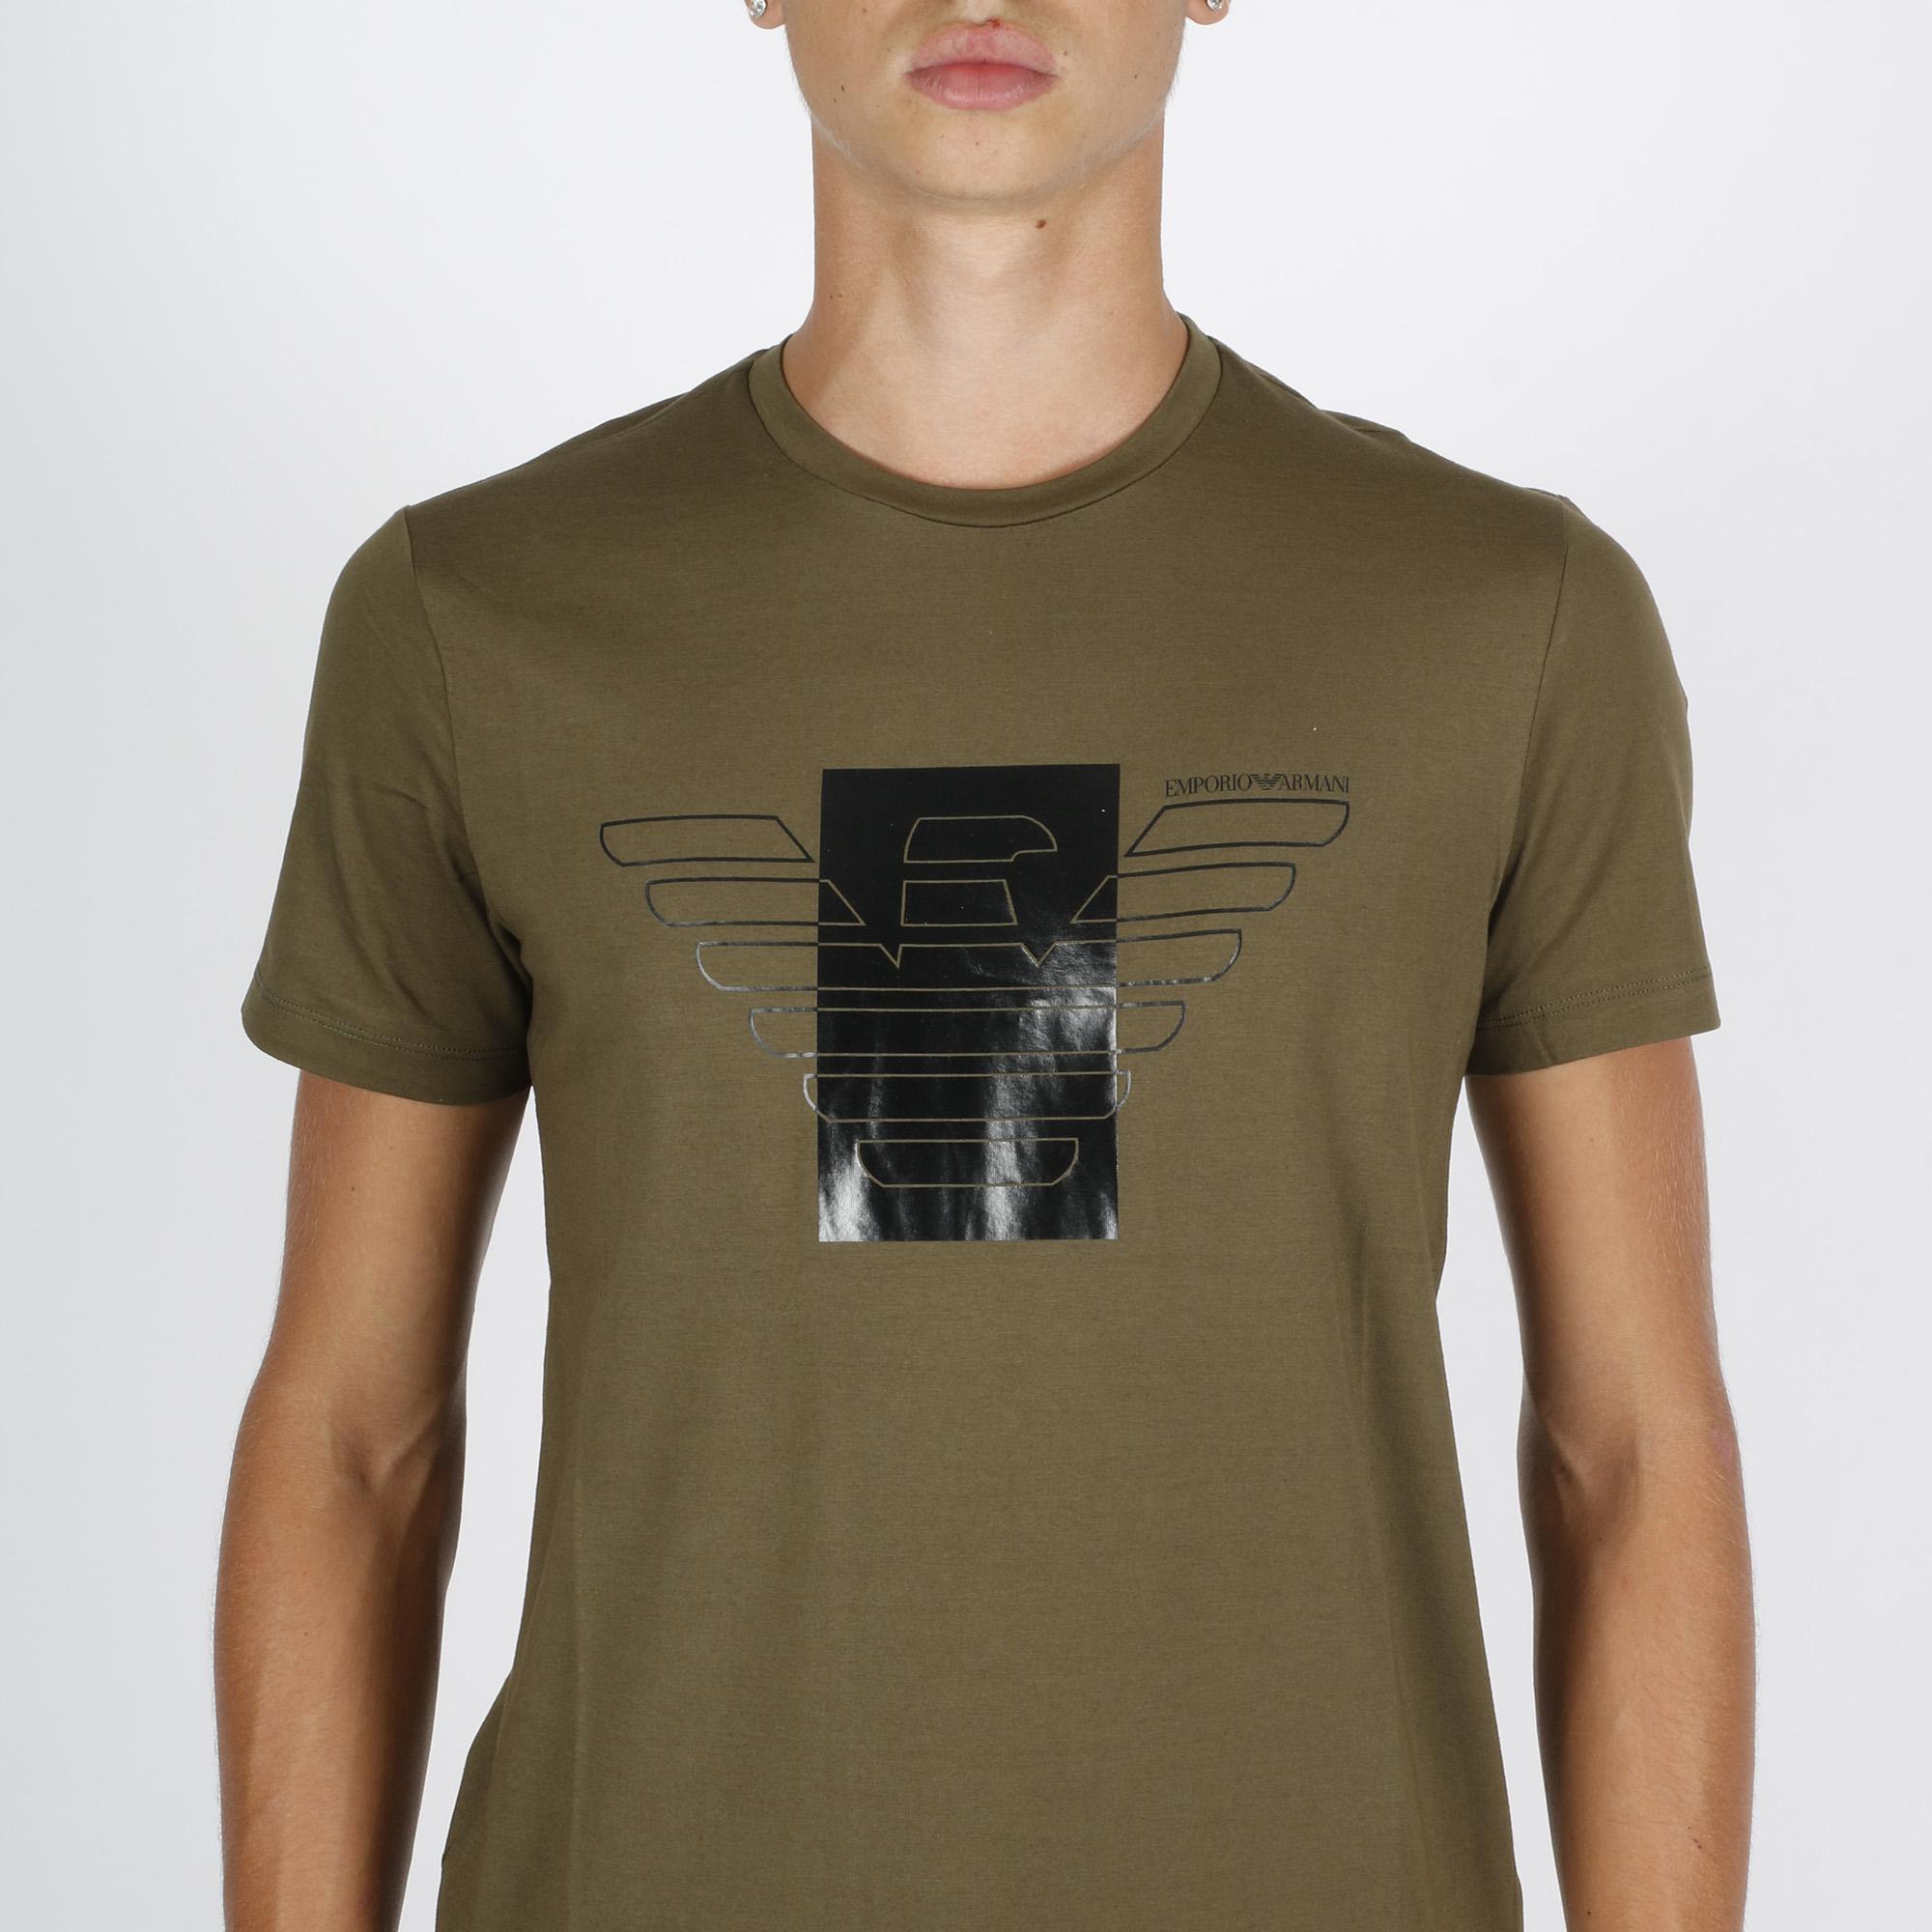 T-shirt st aquila - Verde oliva